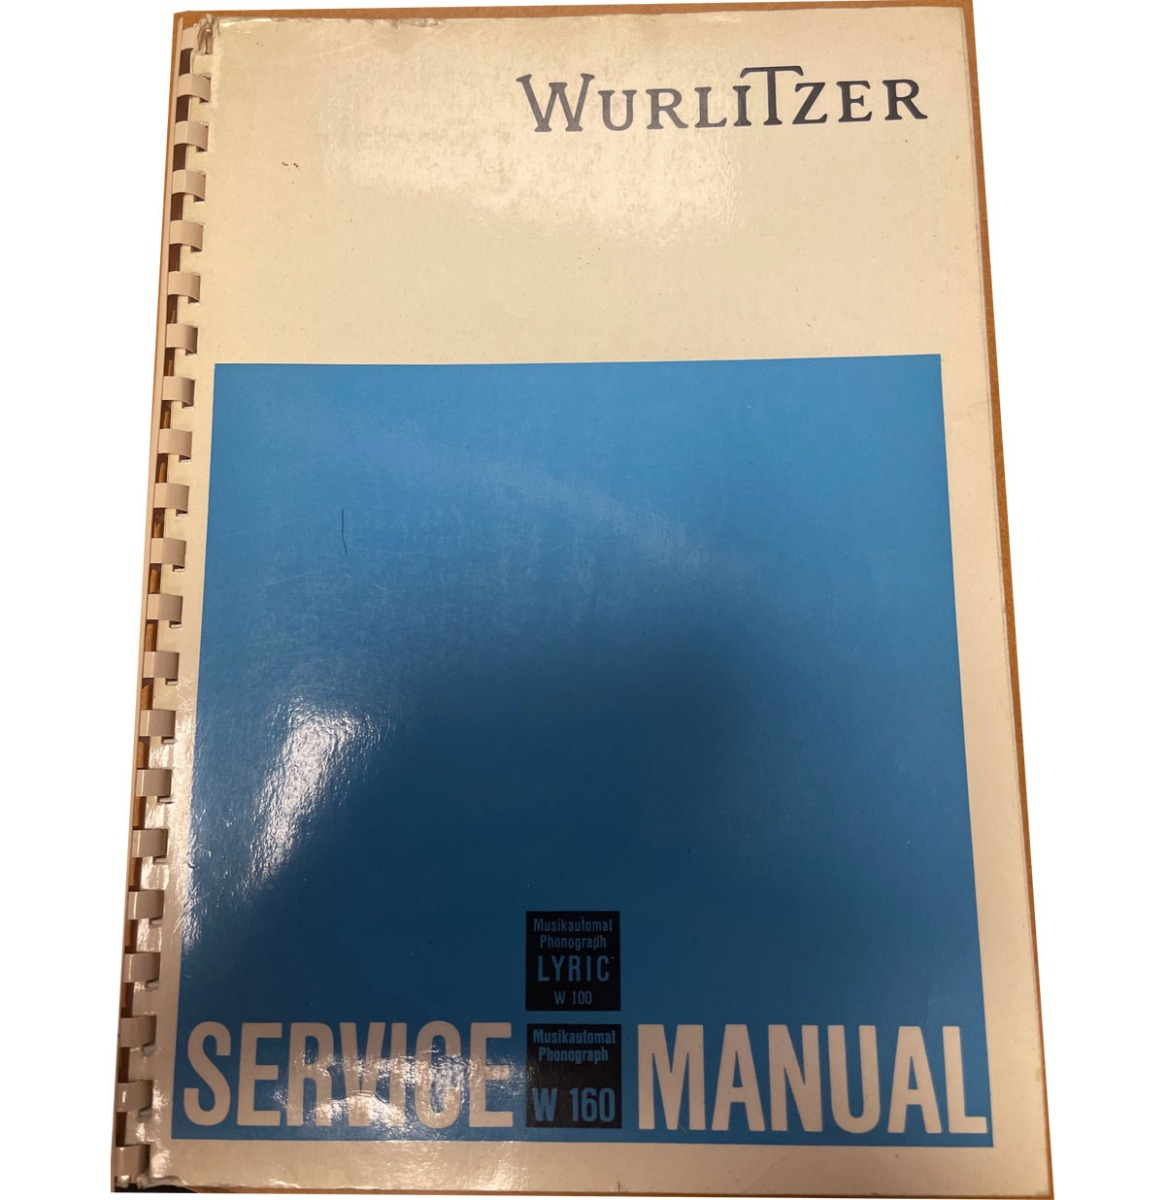 Origineel Manual Wurlitzer Lyric W100 And 160